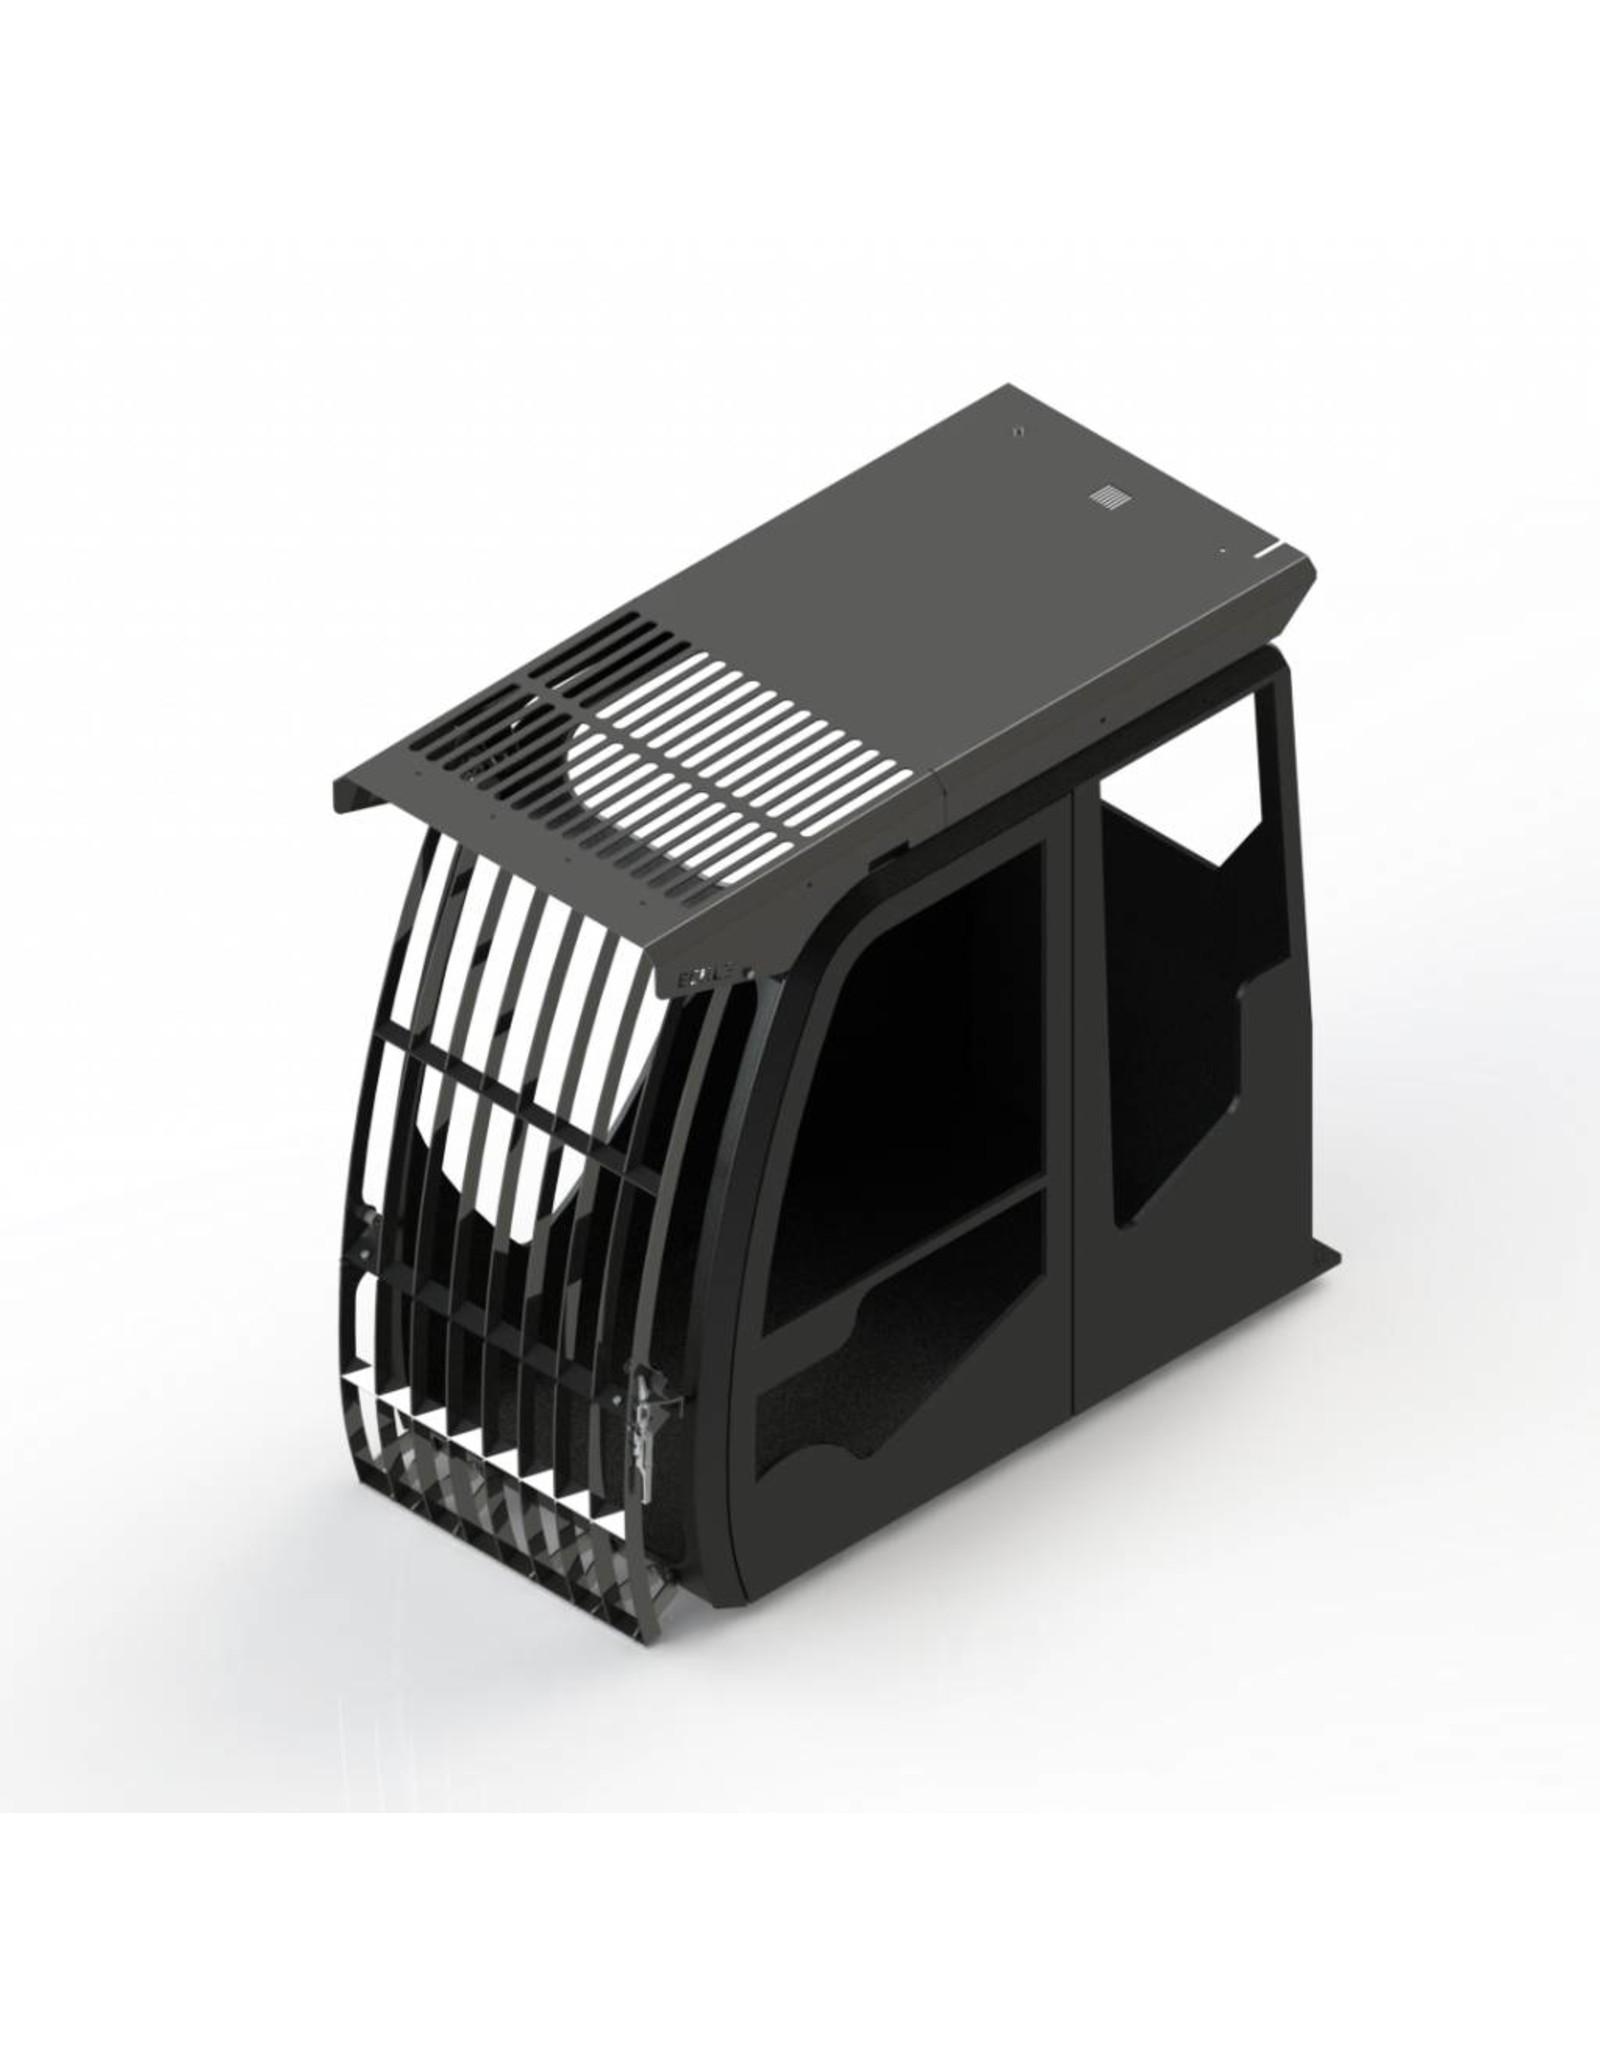 Echle Hartstahl GmbH FOPS for Doosan DX140W-5